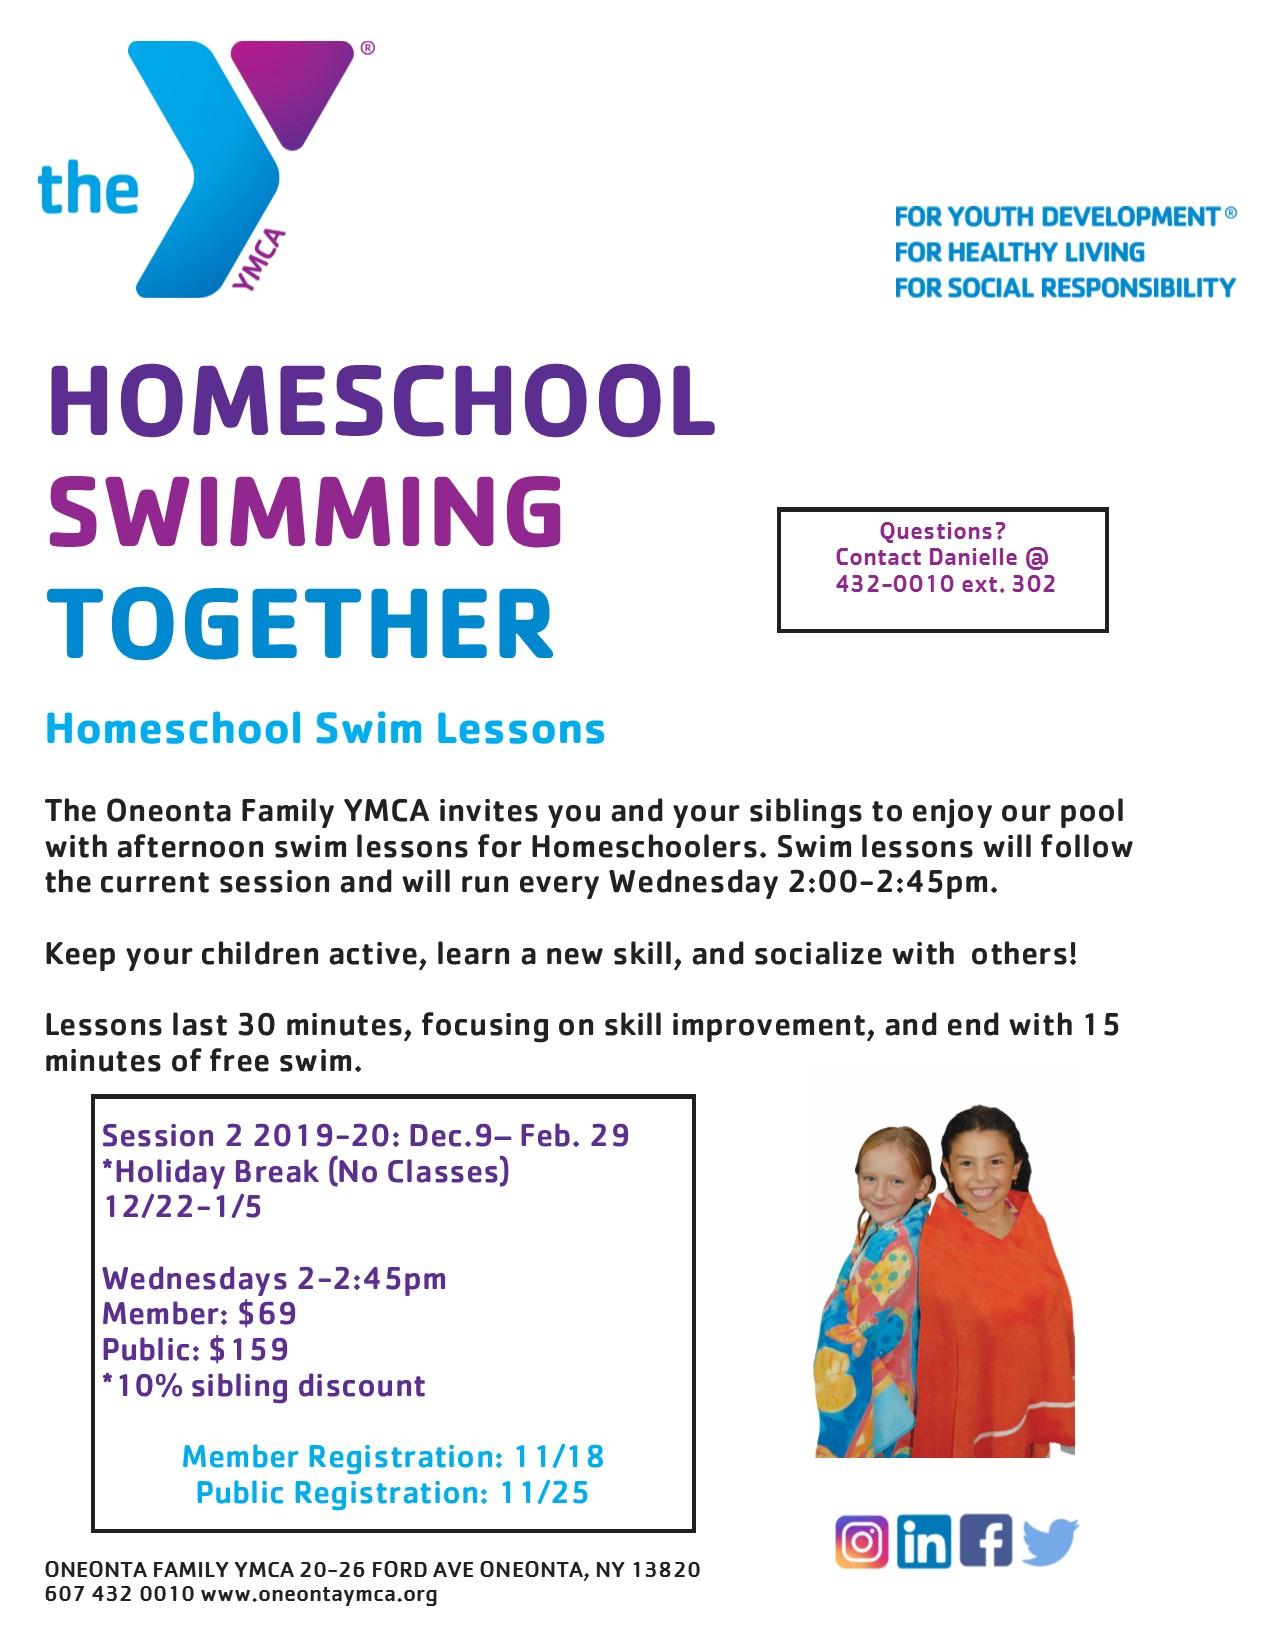 Homeschool Swim Lessons